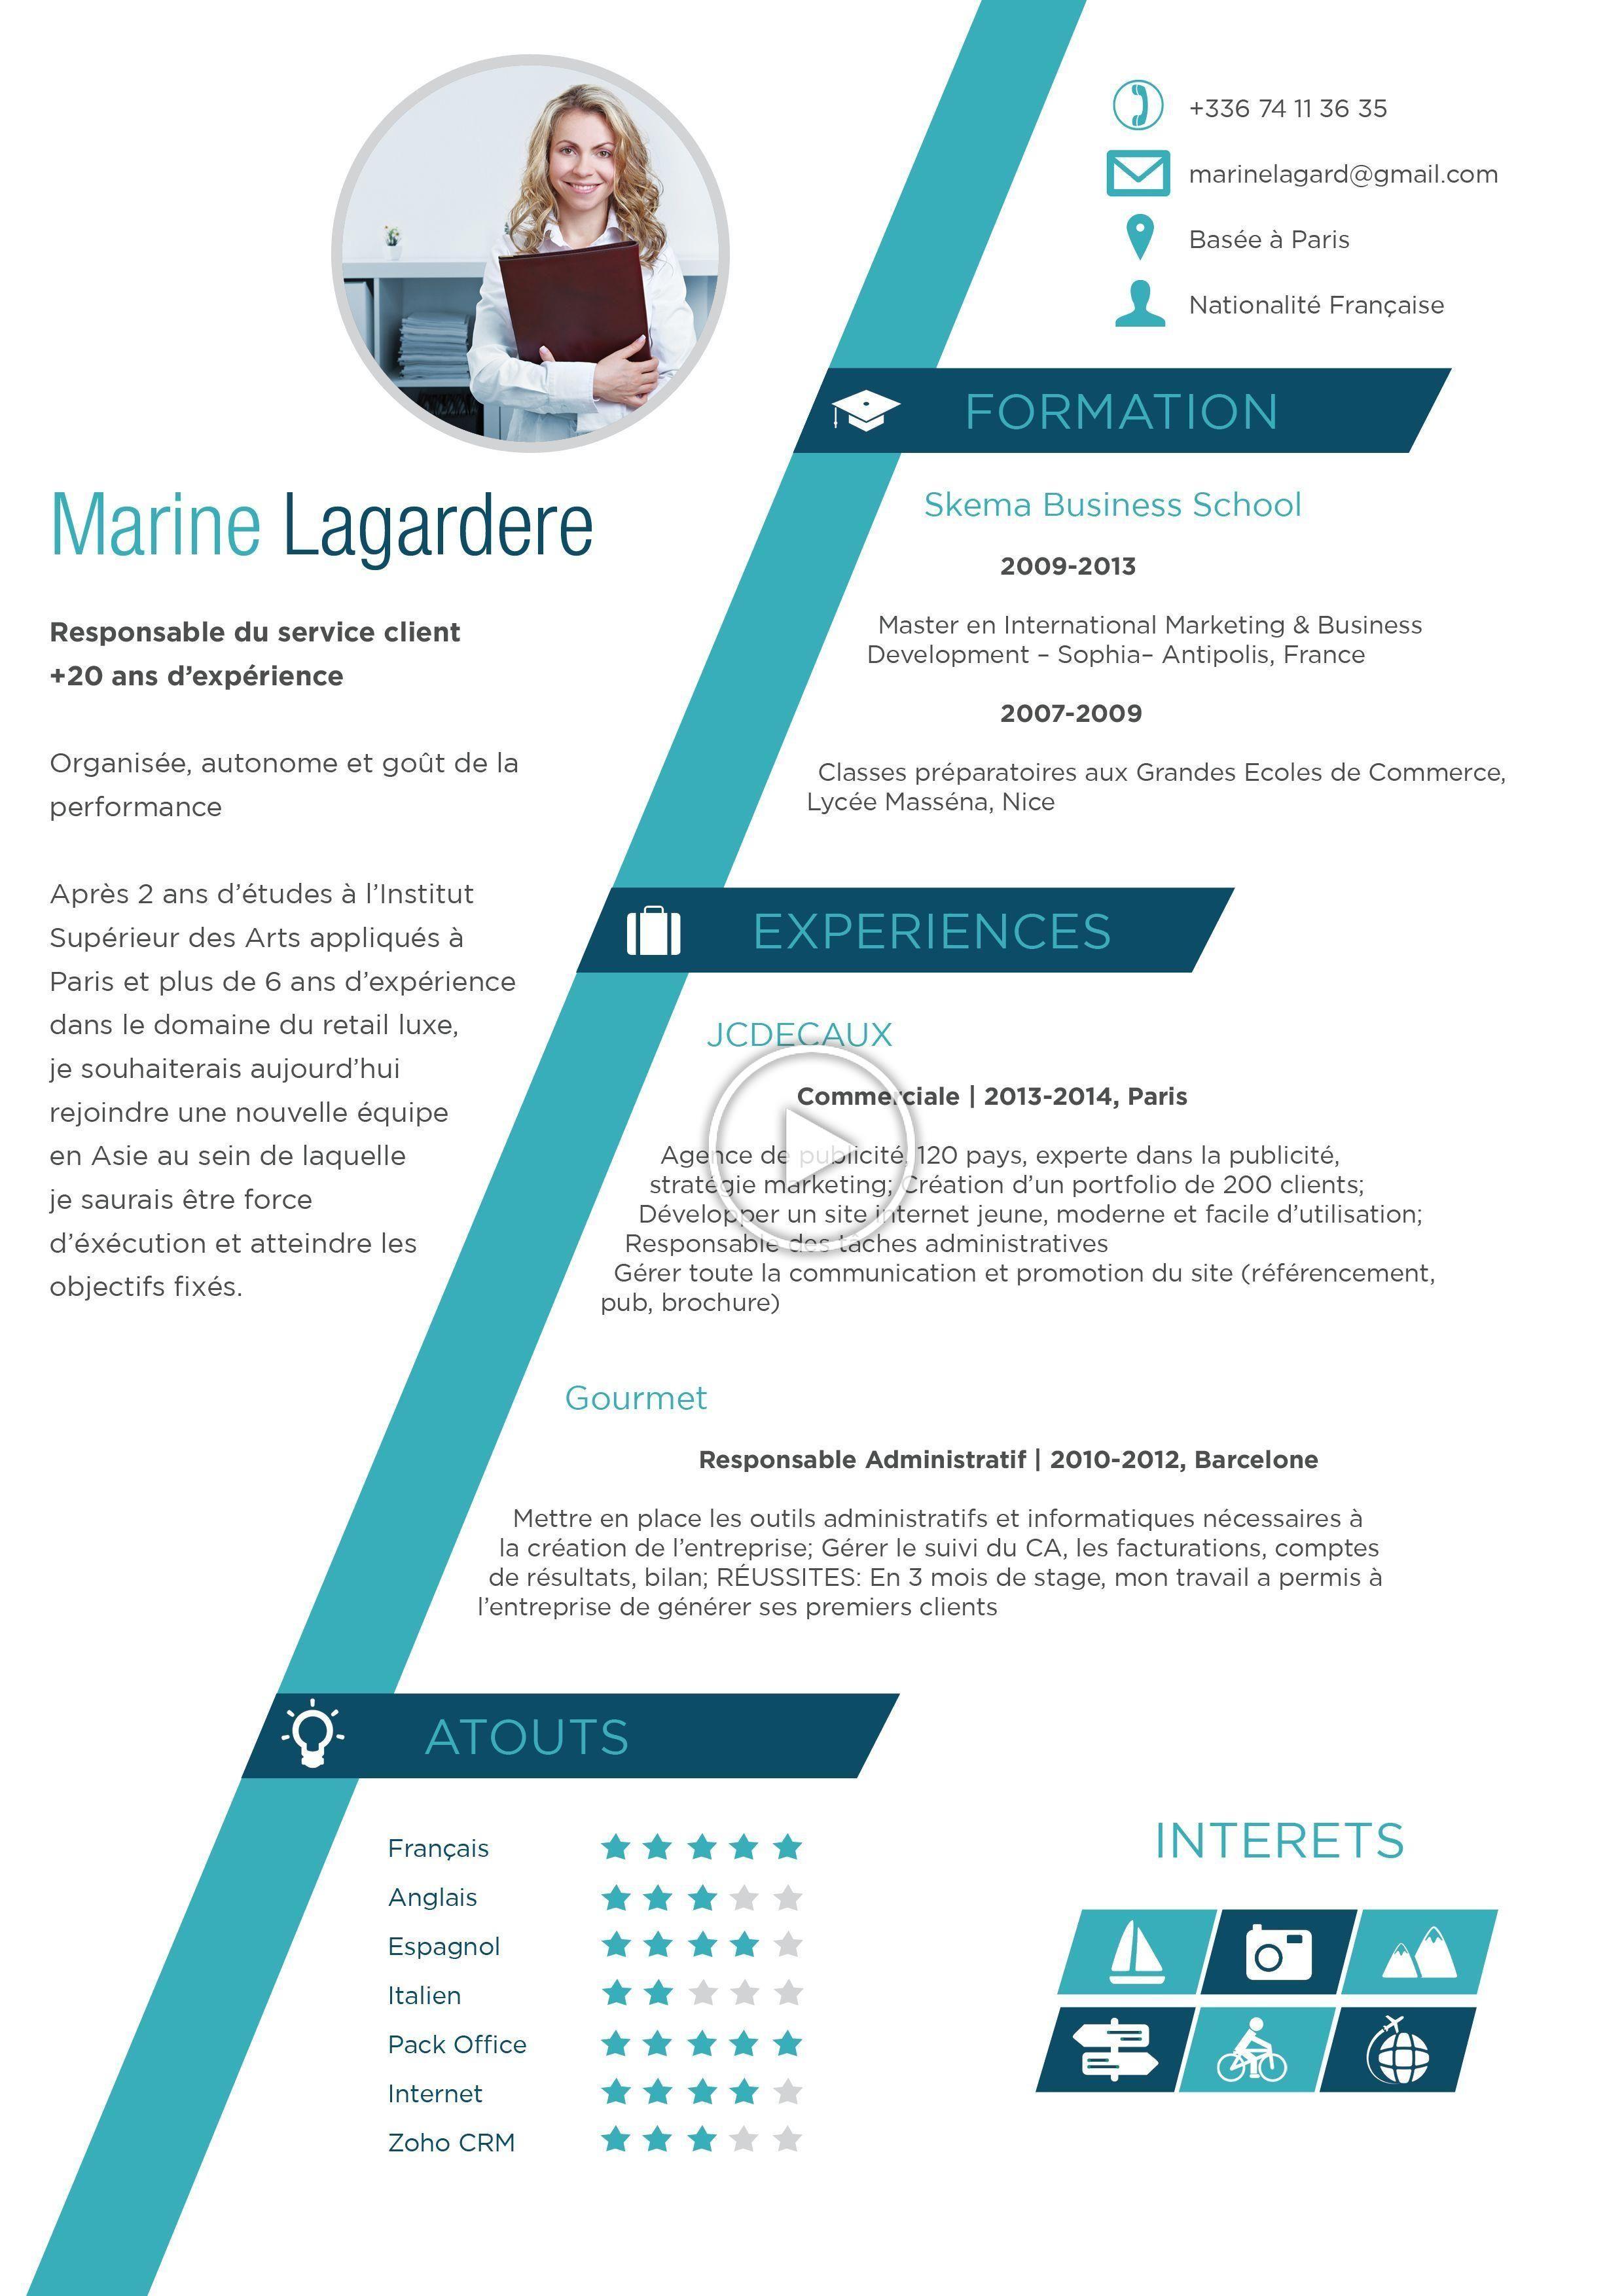 Telecharger Modele Cv Word Original Paysagiste Curriculum Vitae Graphic Design Resume Curriculum Vitae Template Resume Design Template